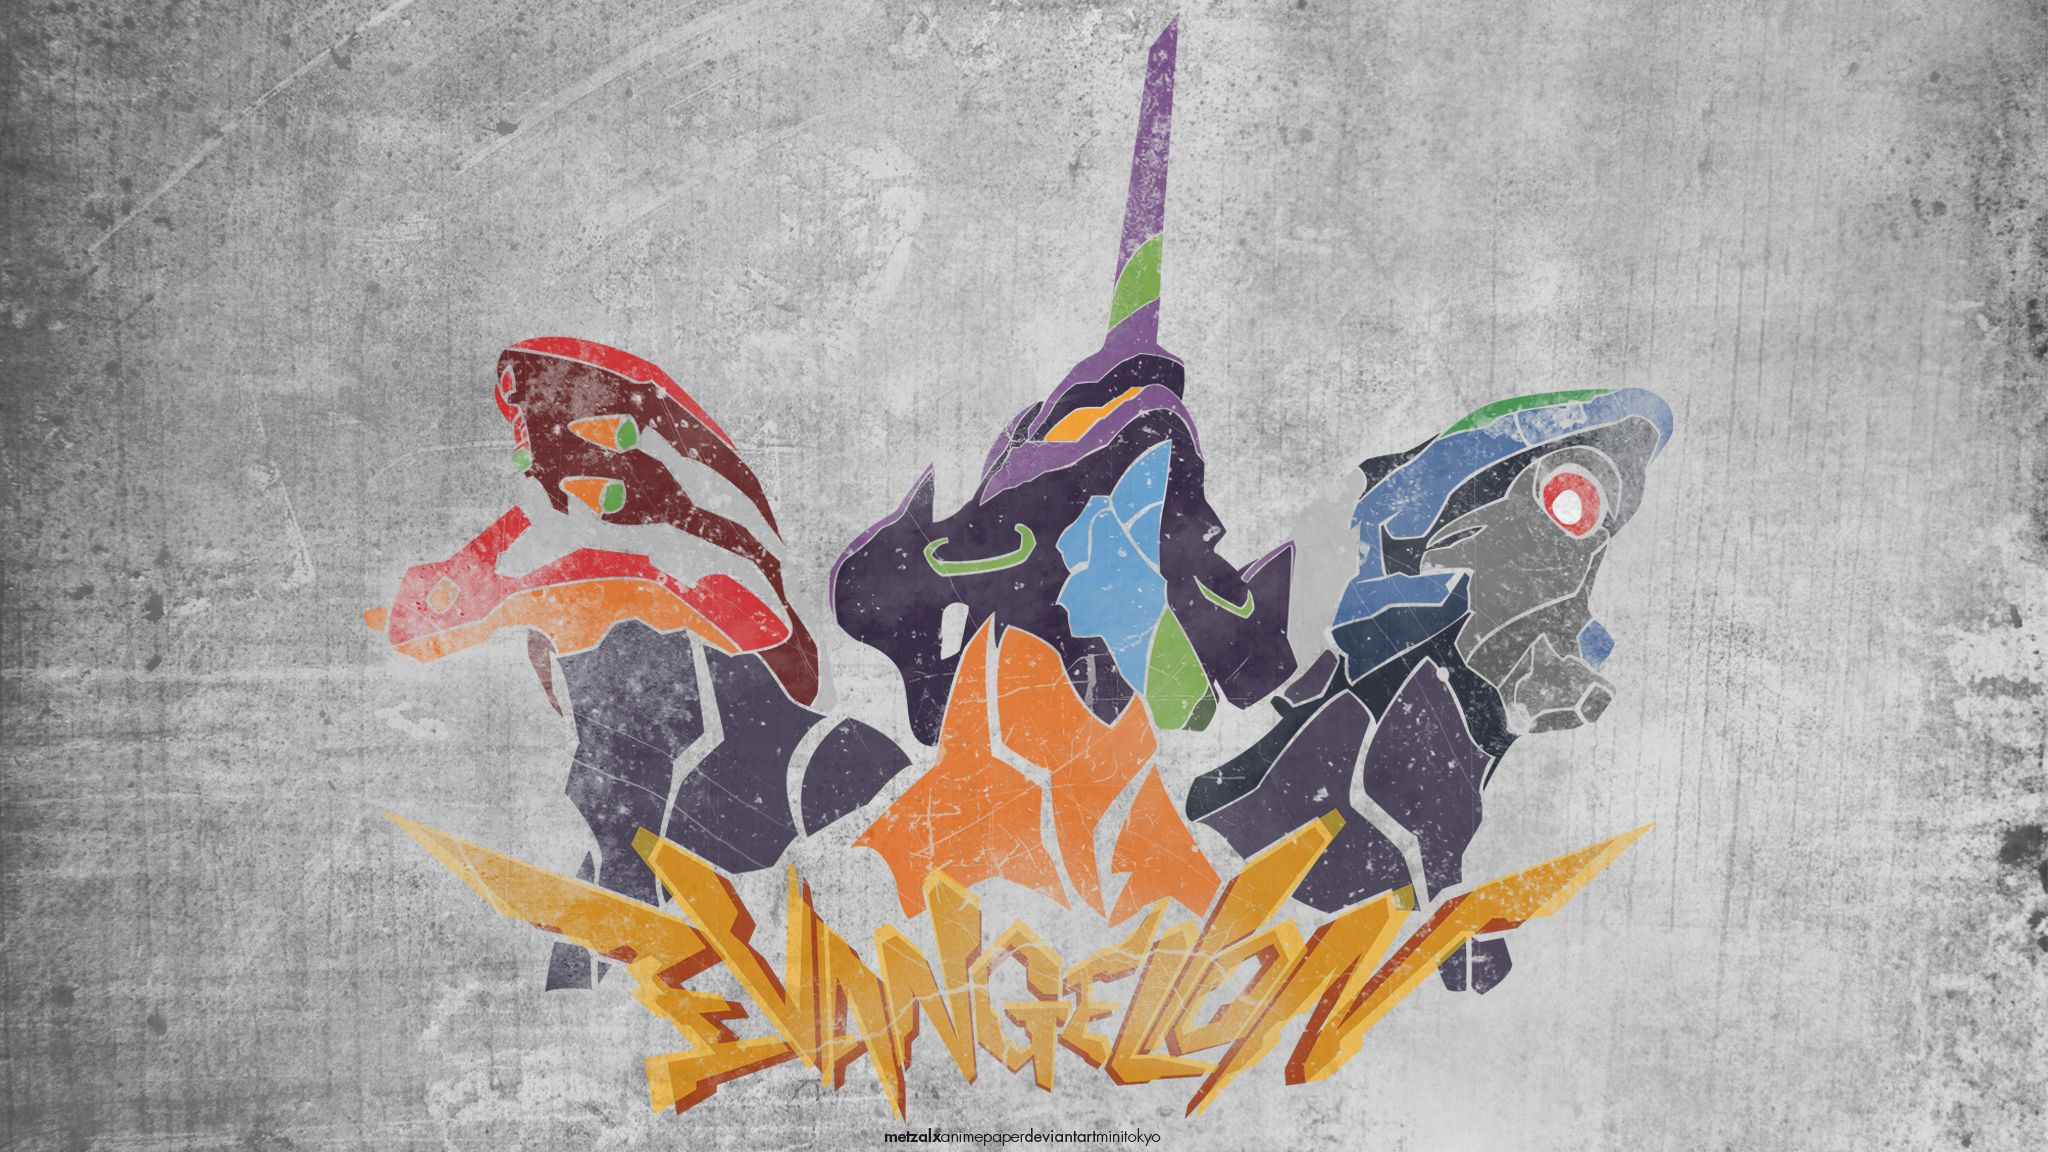 Neon Genesis Evangelion Wallpaper by metzalx Wallpapers